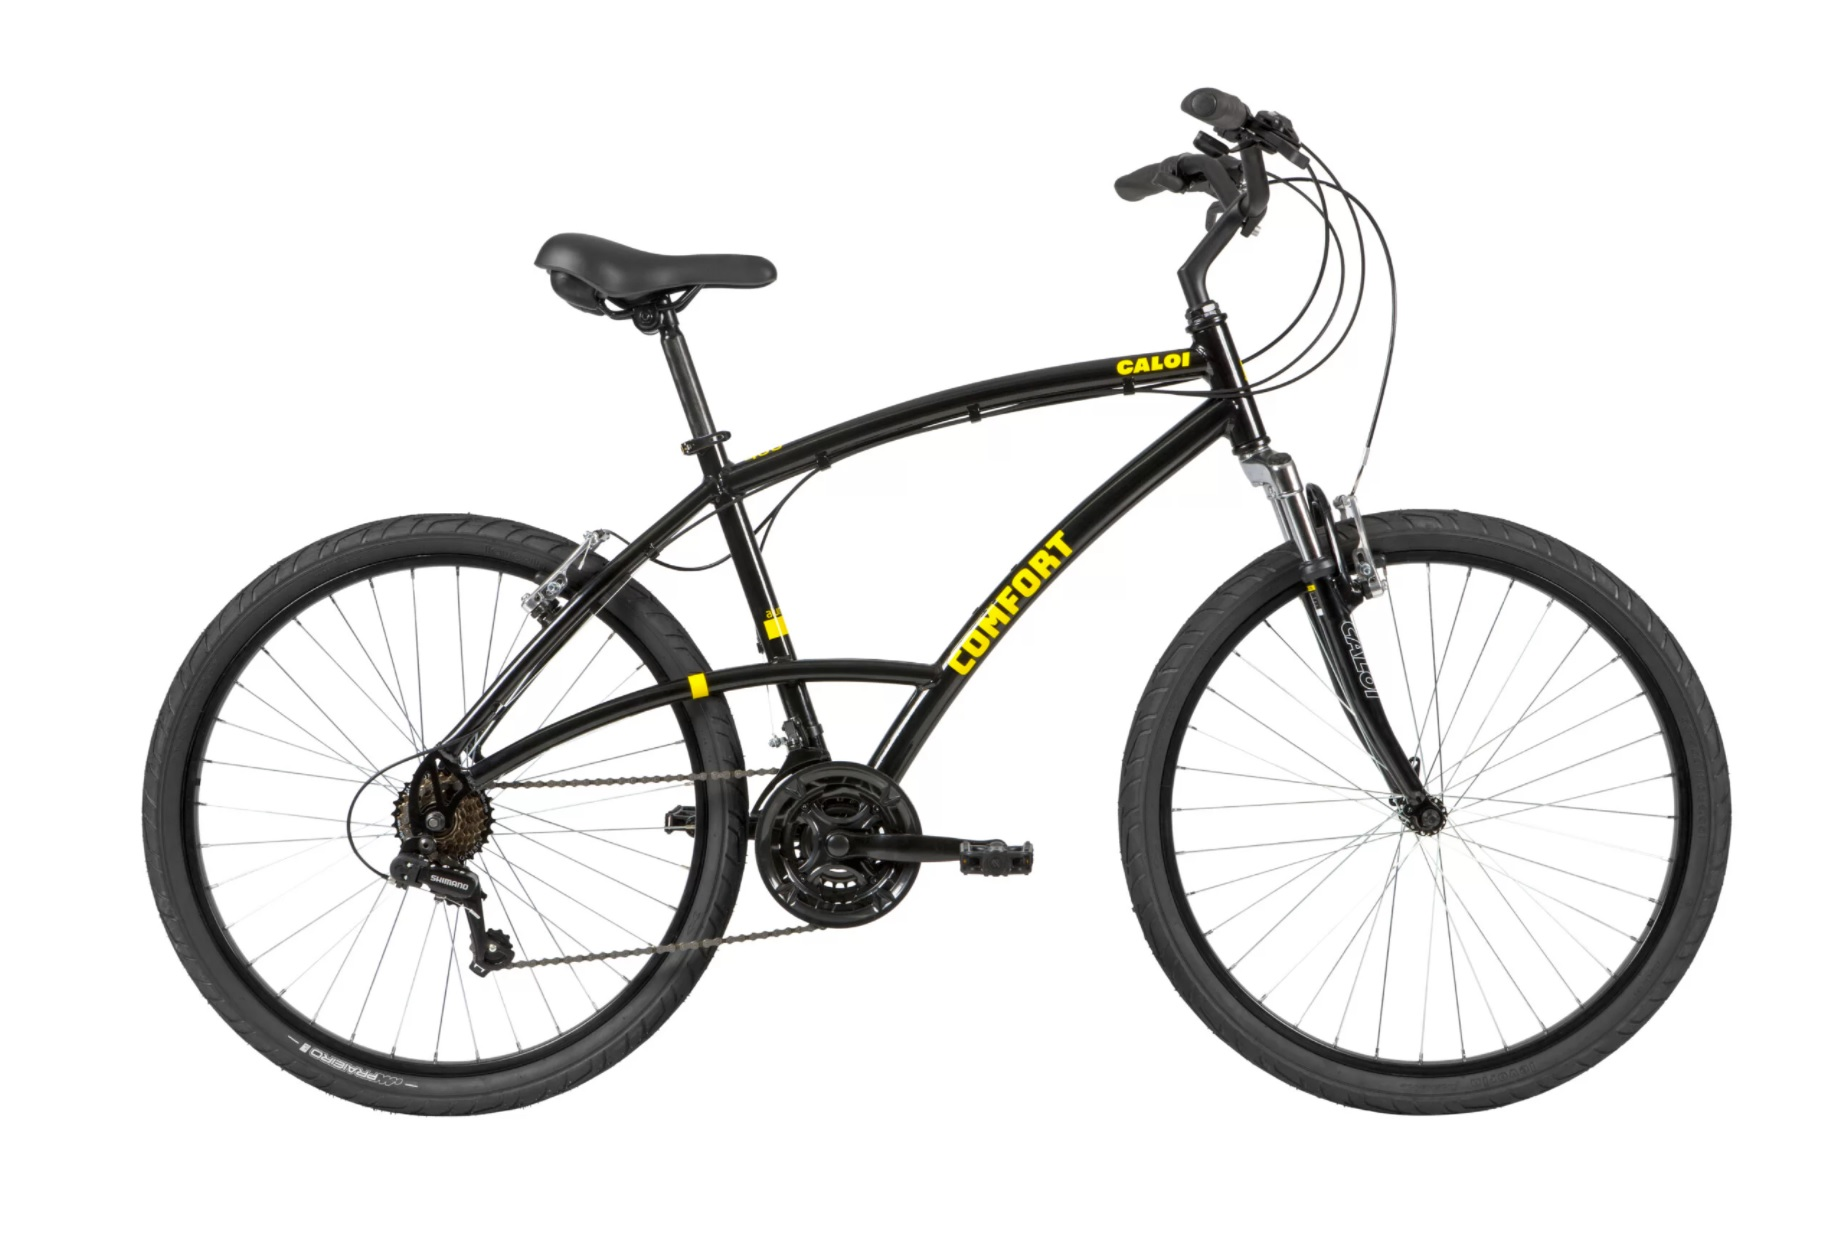 Bicicleta Aro 26 Masculina Caloi 400 Comfort 21v - Preto